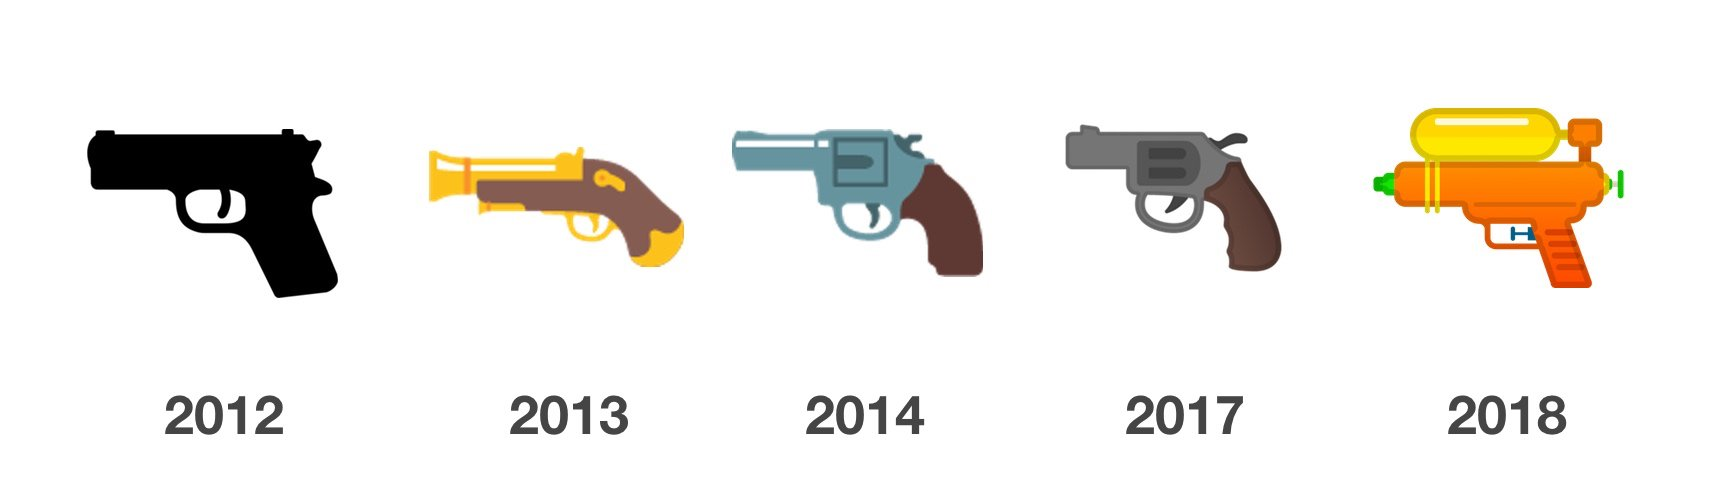 Android Pistolen-Emojis